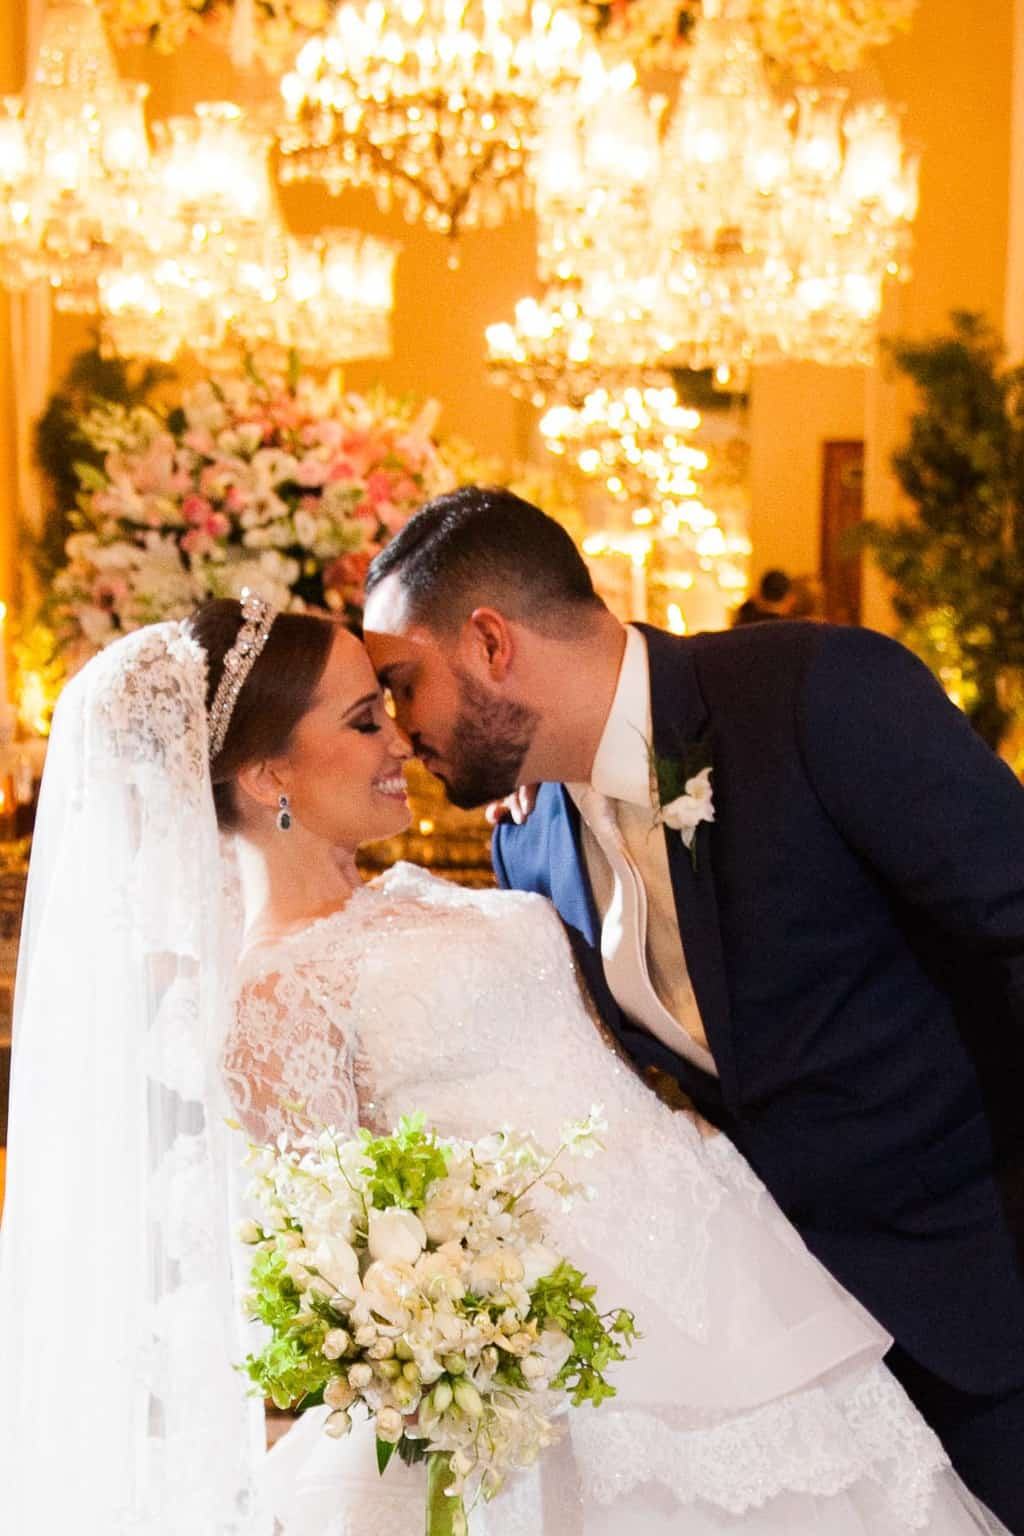 Casamento-Clássico-Casamento-tradicional-Copacabana-Palace-Monica-Roias-Poses-Casal-Ribas-Foto-e-Vídeo-Tuanny-e-Bernardo-CaseMe-4